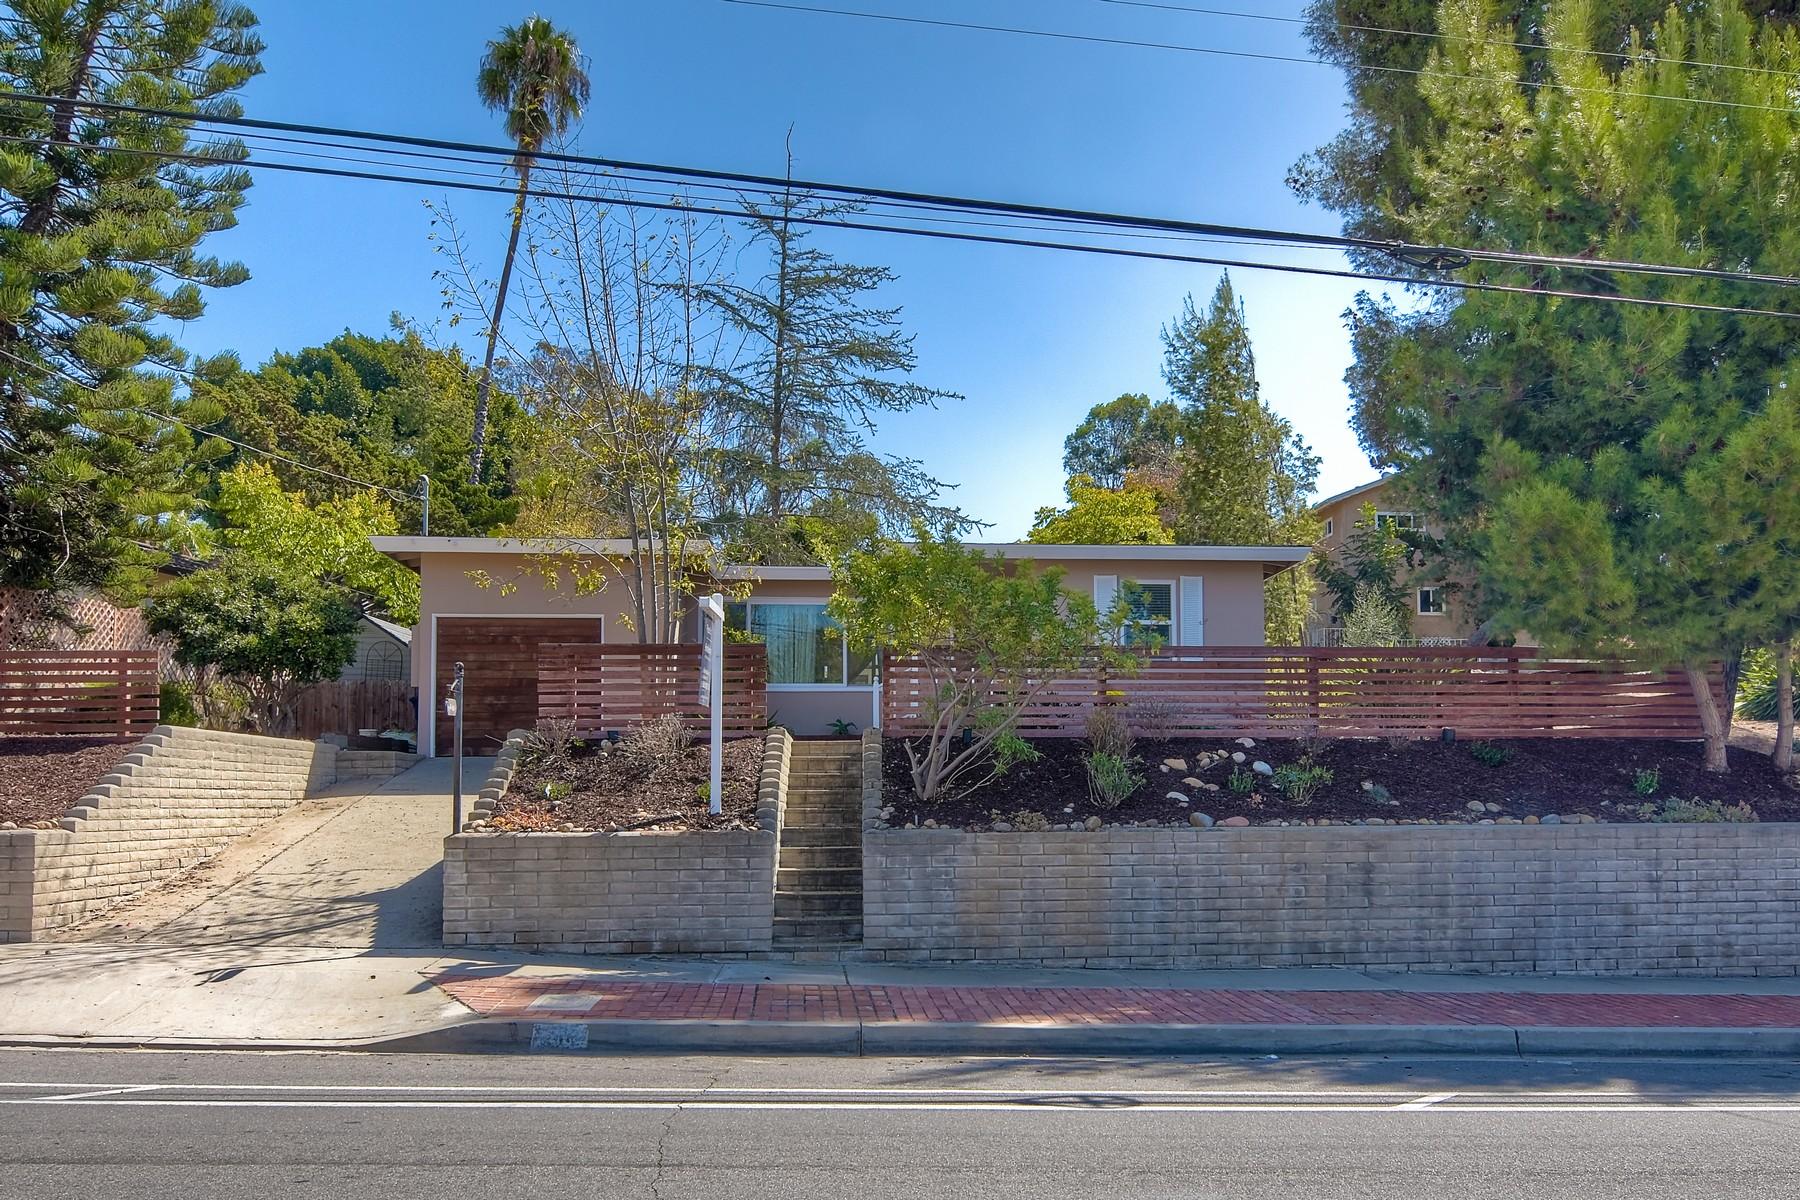 Single Family Homes for Sale at 6115 Amaya Dr La Mesa, California 91941 United States